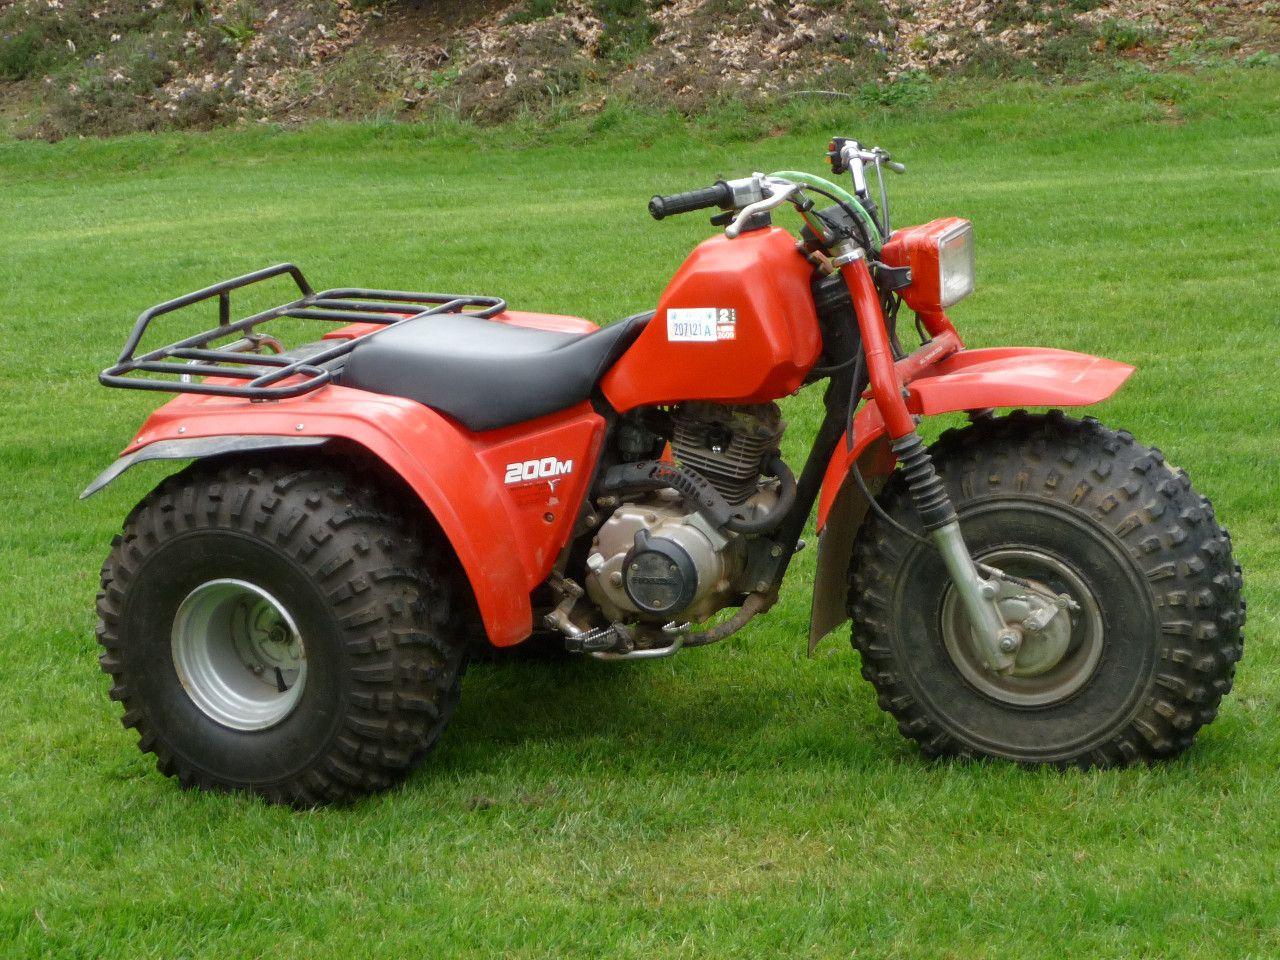 Honda 3 Wheeler For Sale >> Used 1984 Honda Other Atvs For Sale In Washington 1984